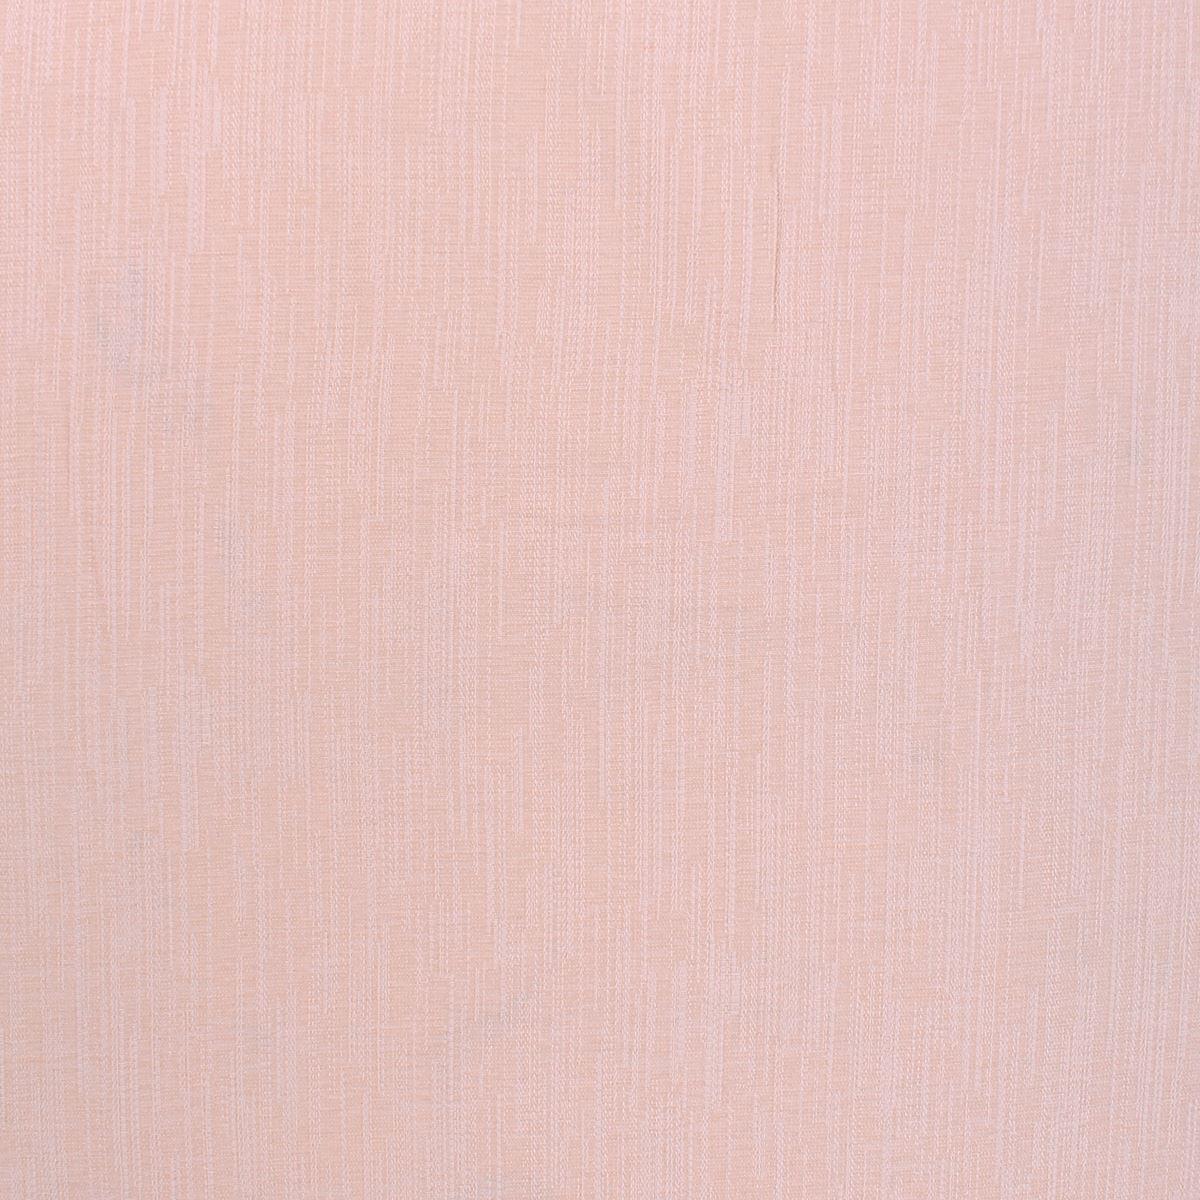 034-Chenille-034-Slubbed-Shabby-Worn-Look-Curtain-Cushion-Sofa-Upholstery-Fabric thumbnail 31